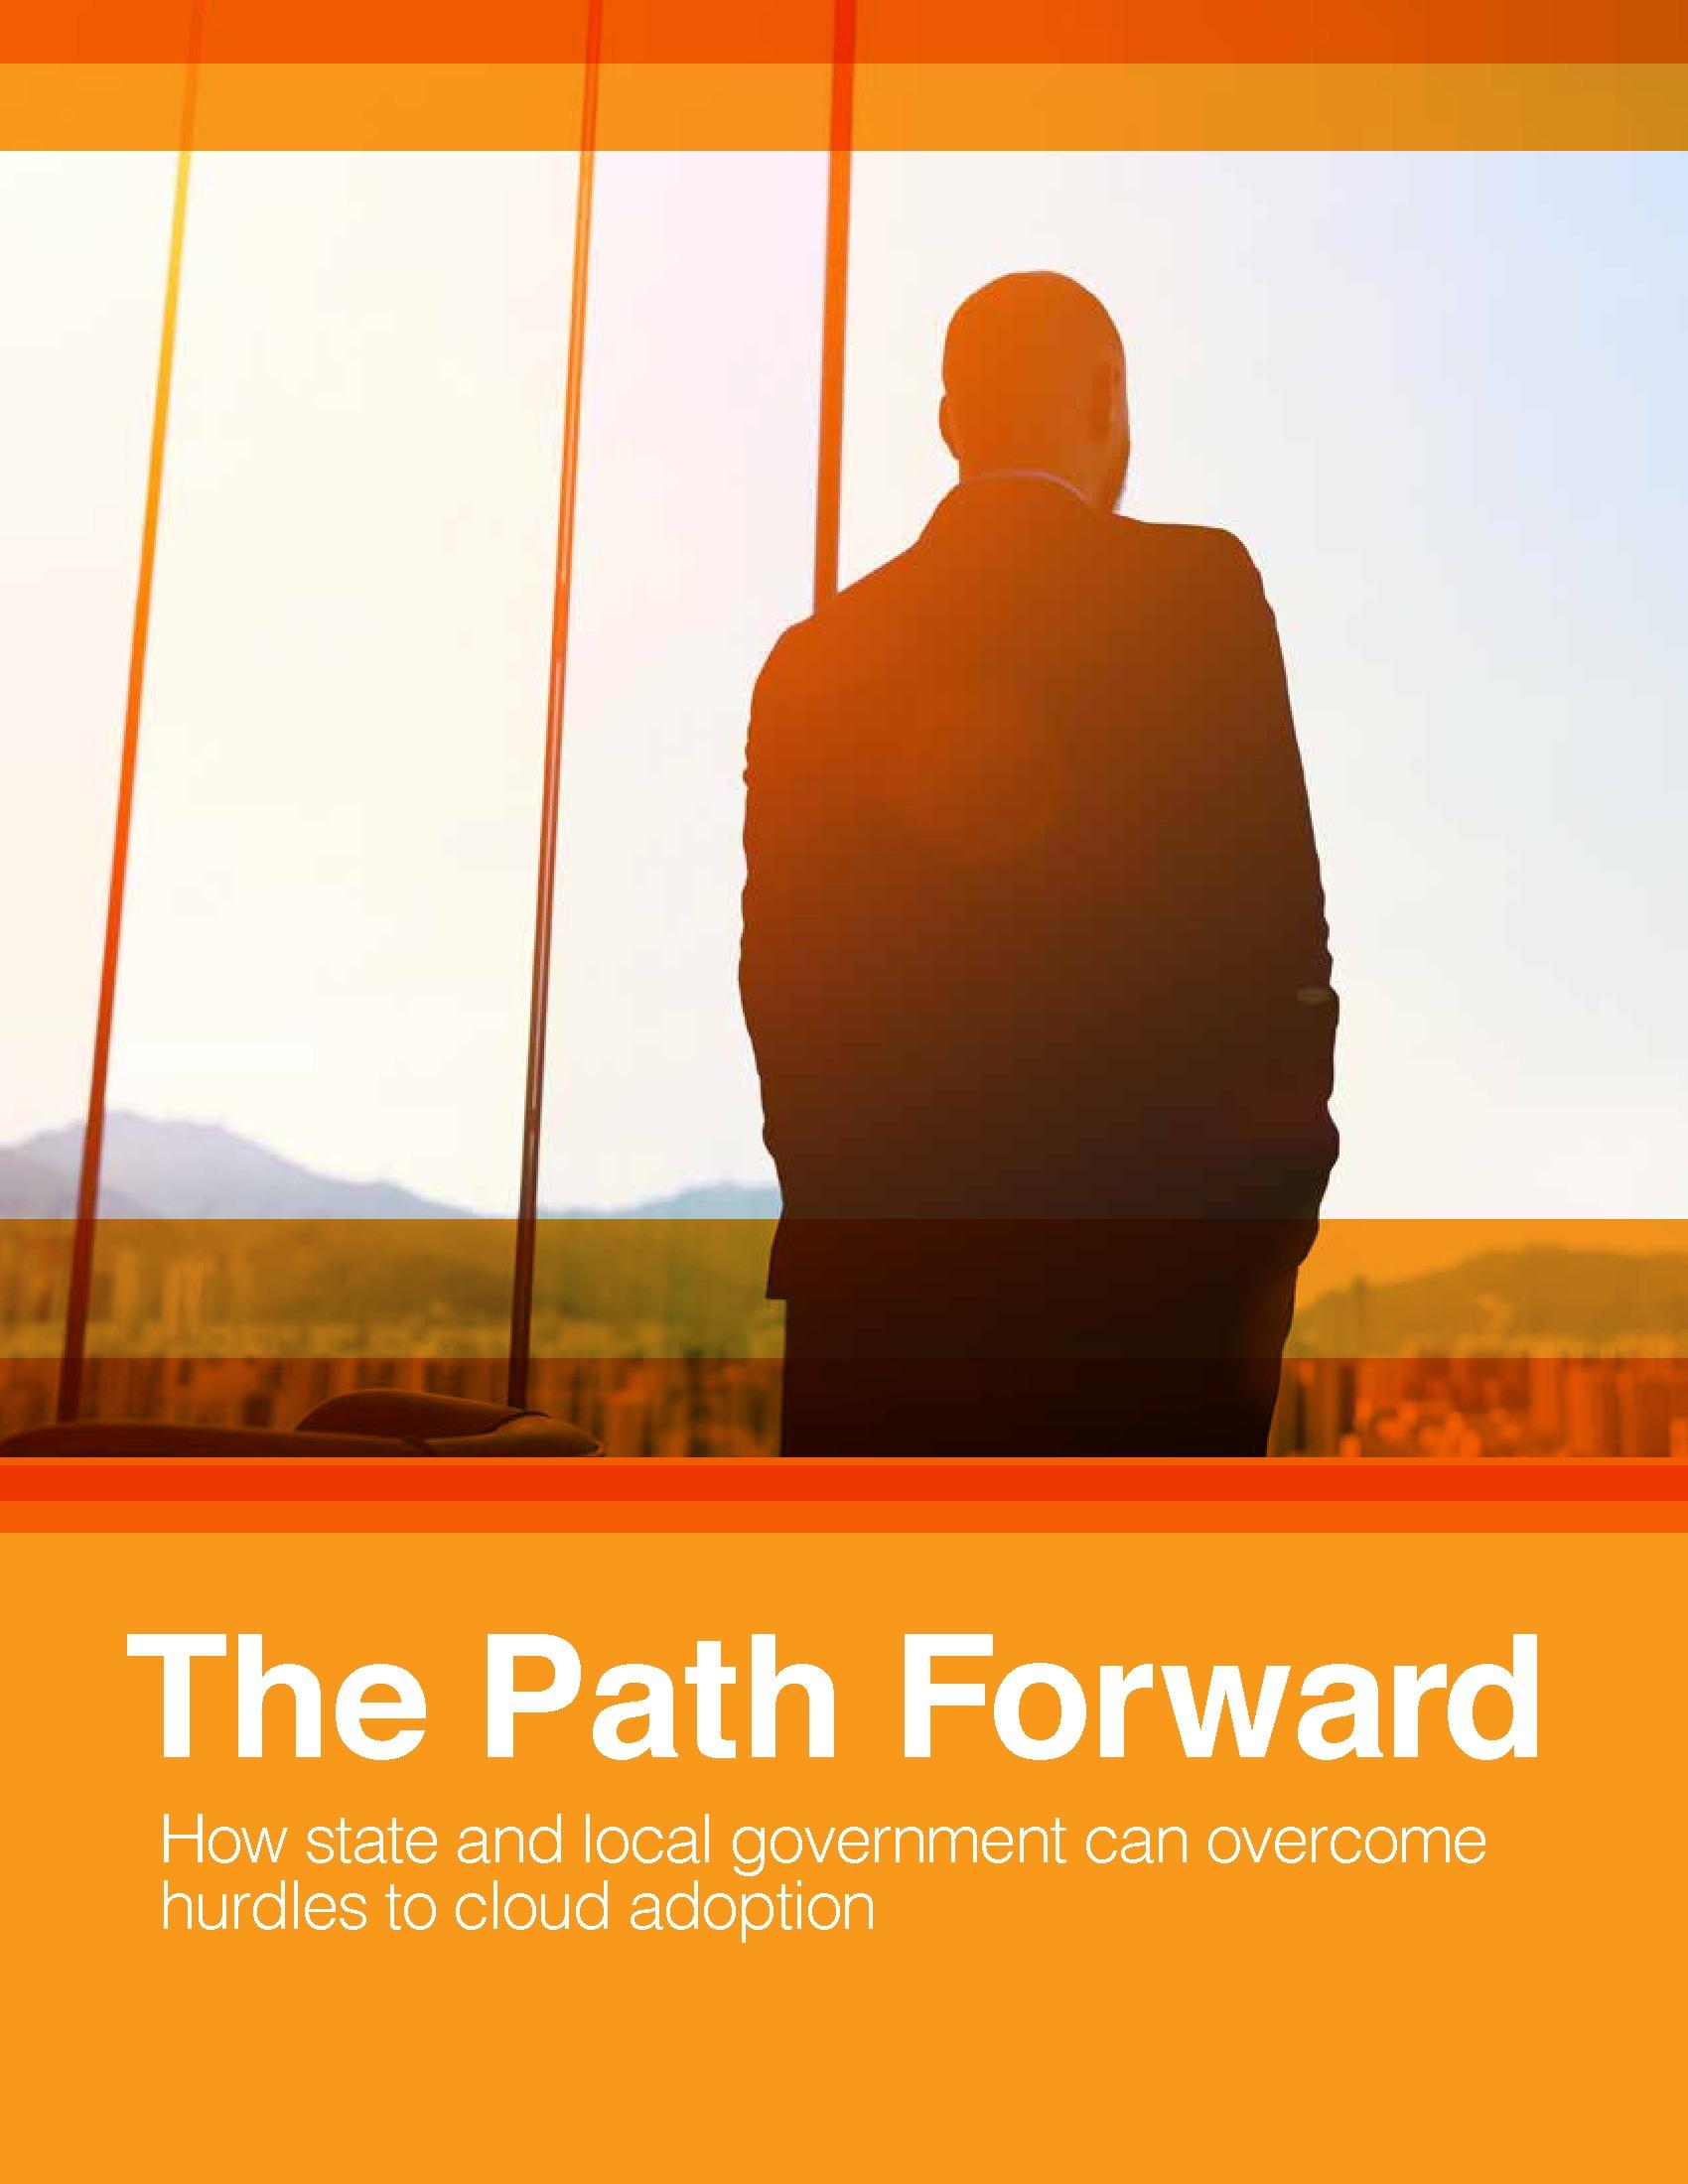 GT - Amazon - Issue Brief - 180821 - The Path Forward